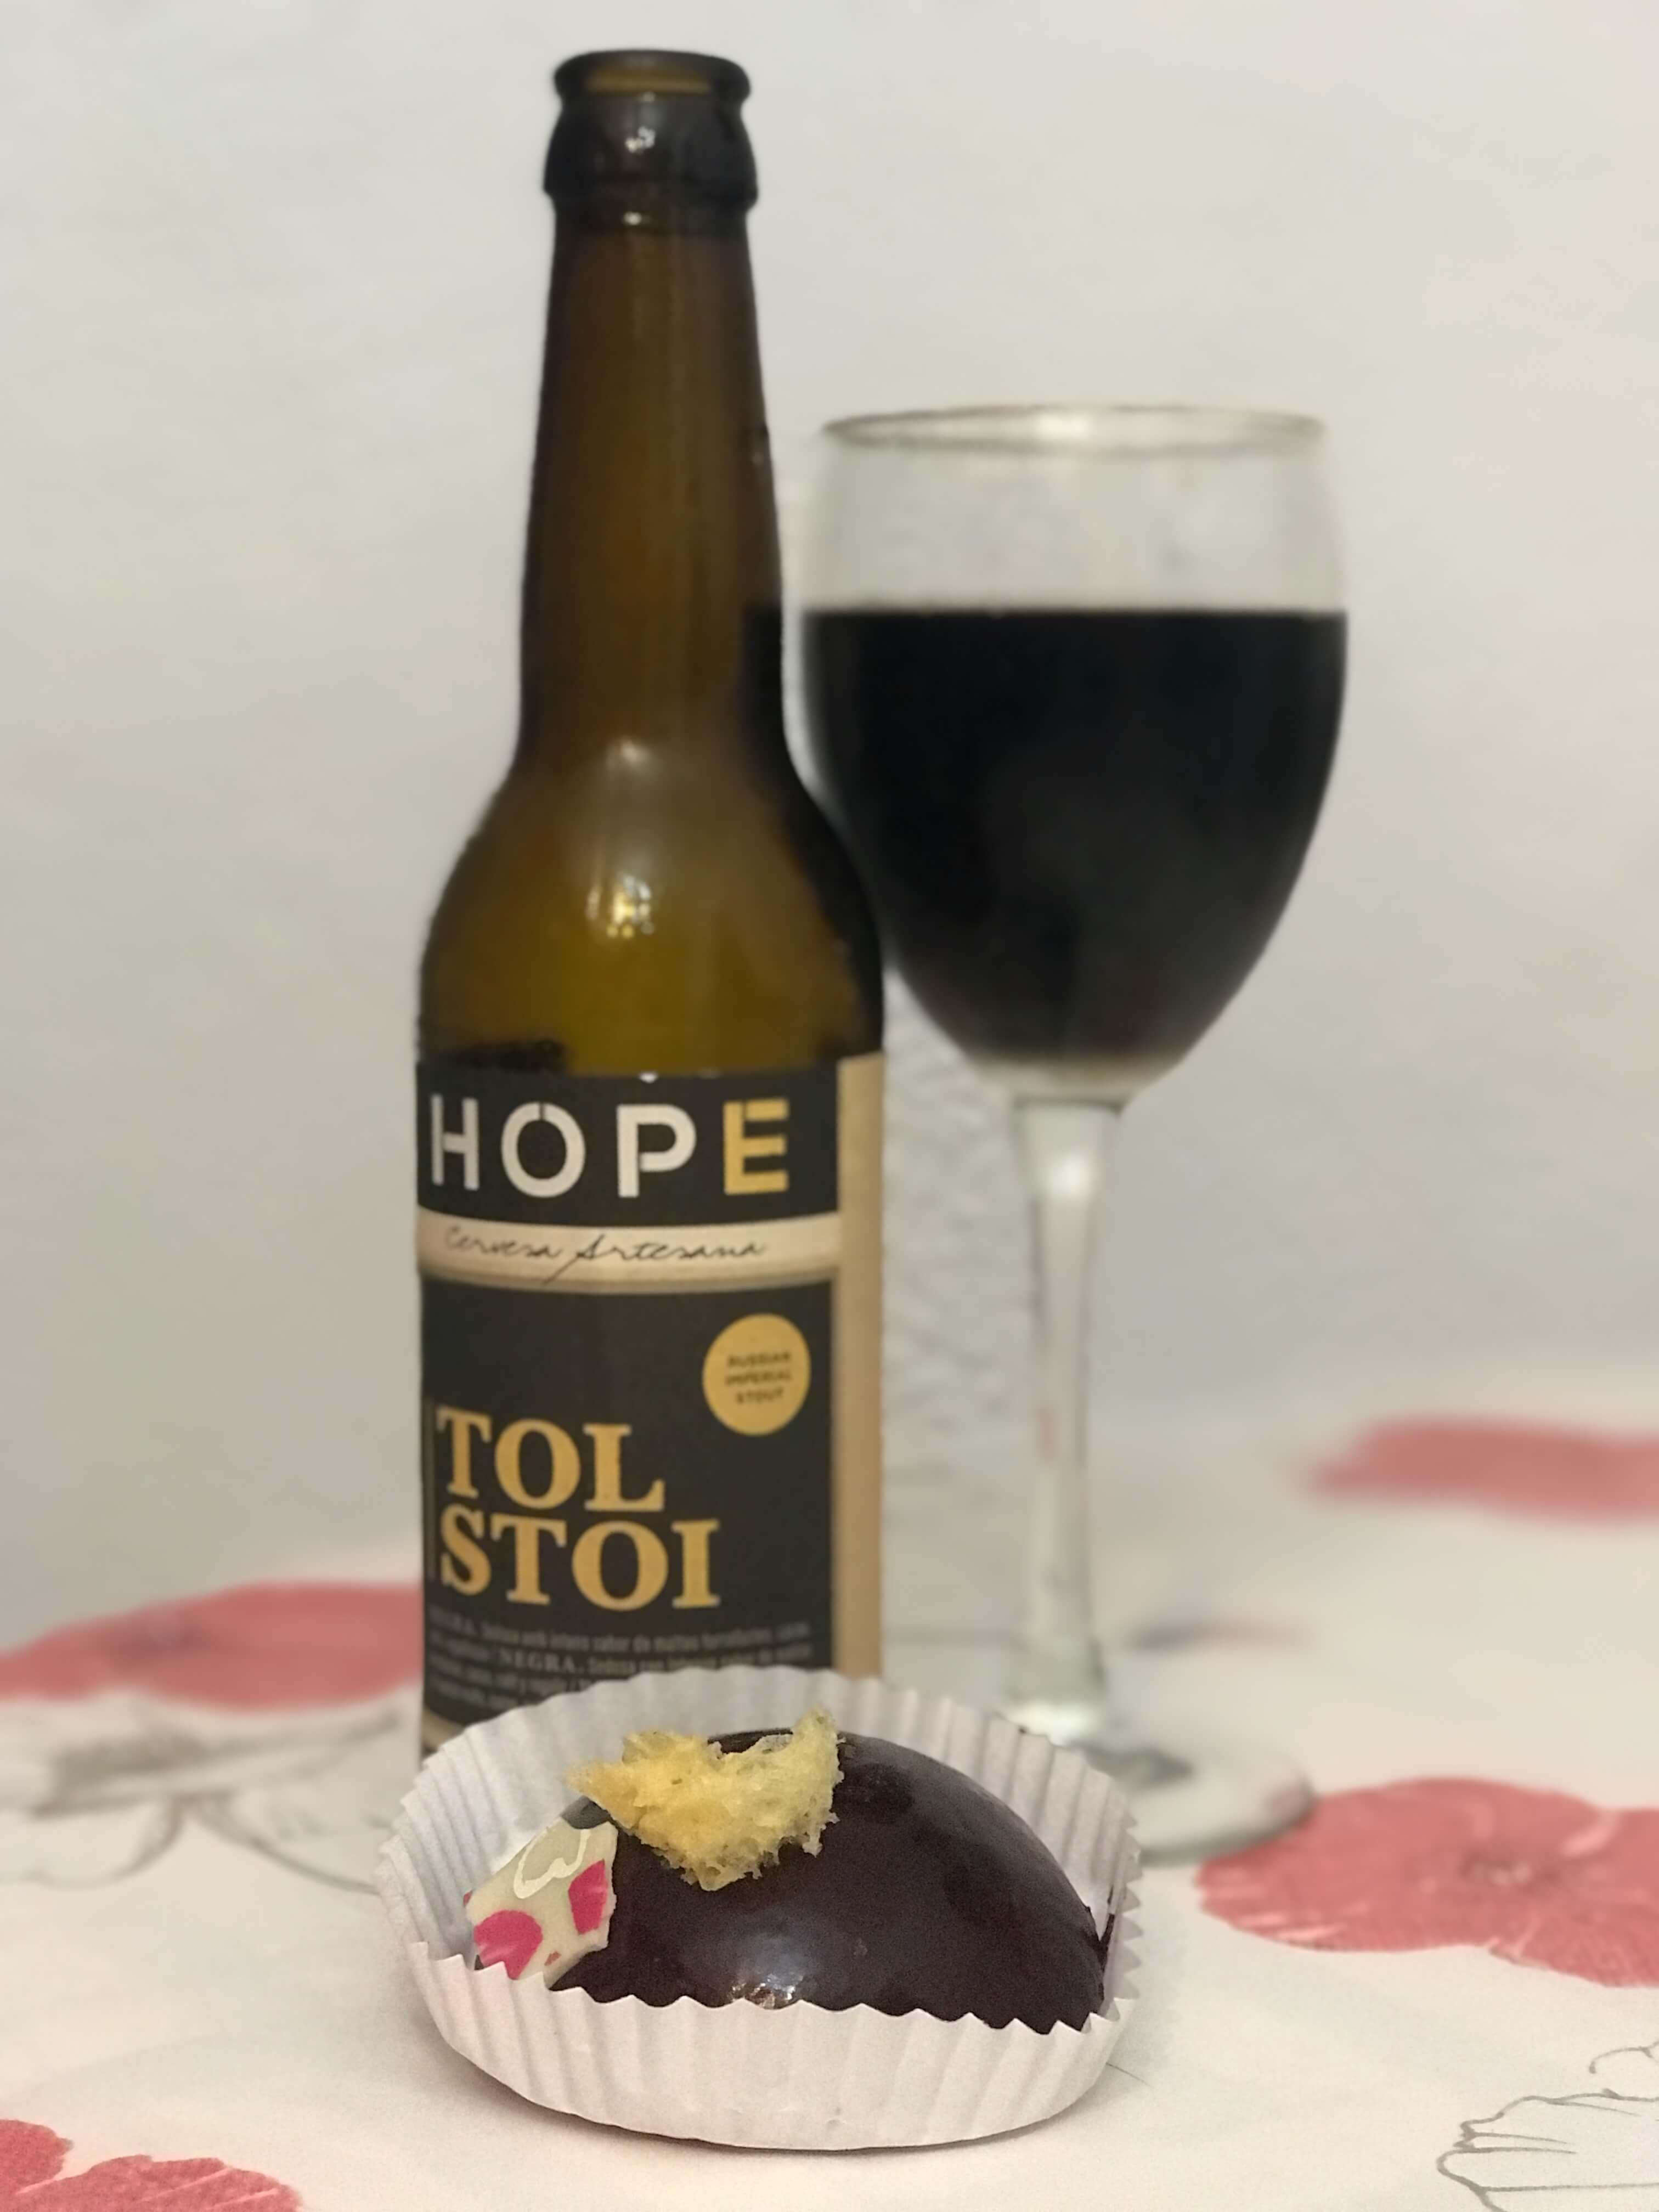 TOLSTOI - CERVEZA HOPE